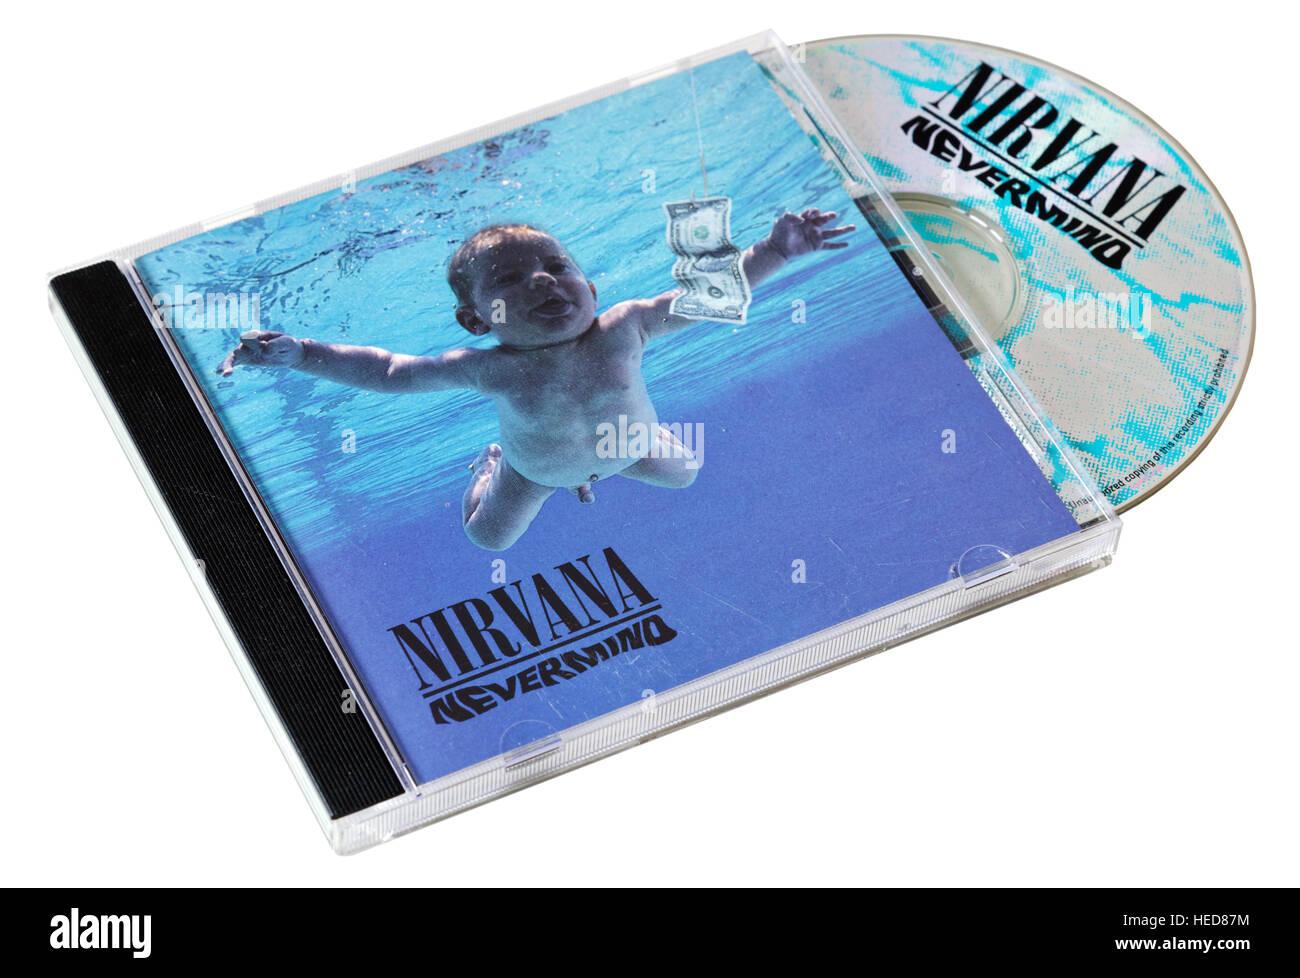 Nirvana Nevermind CD Stock Photo 129369624